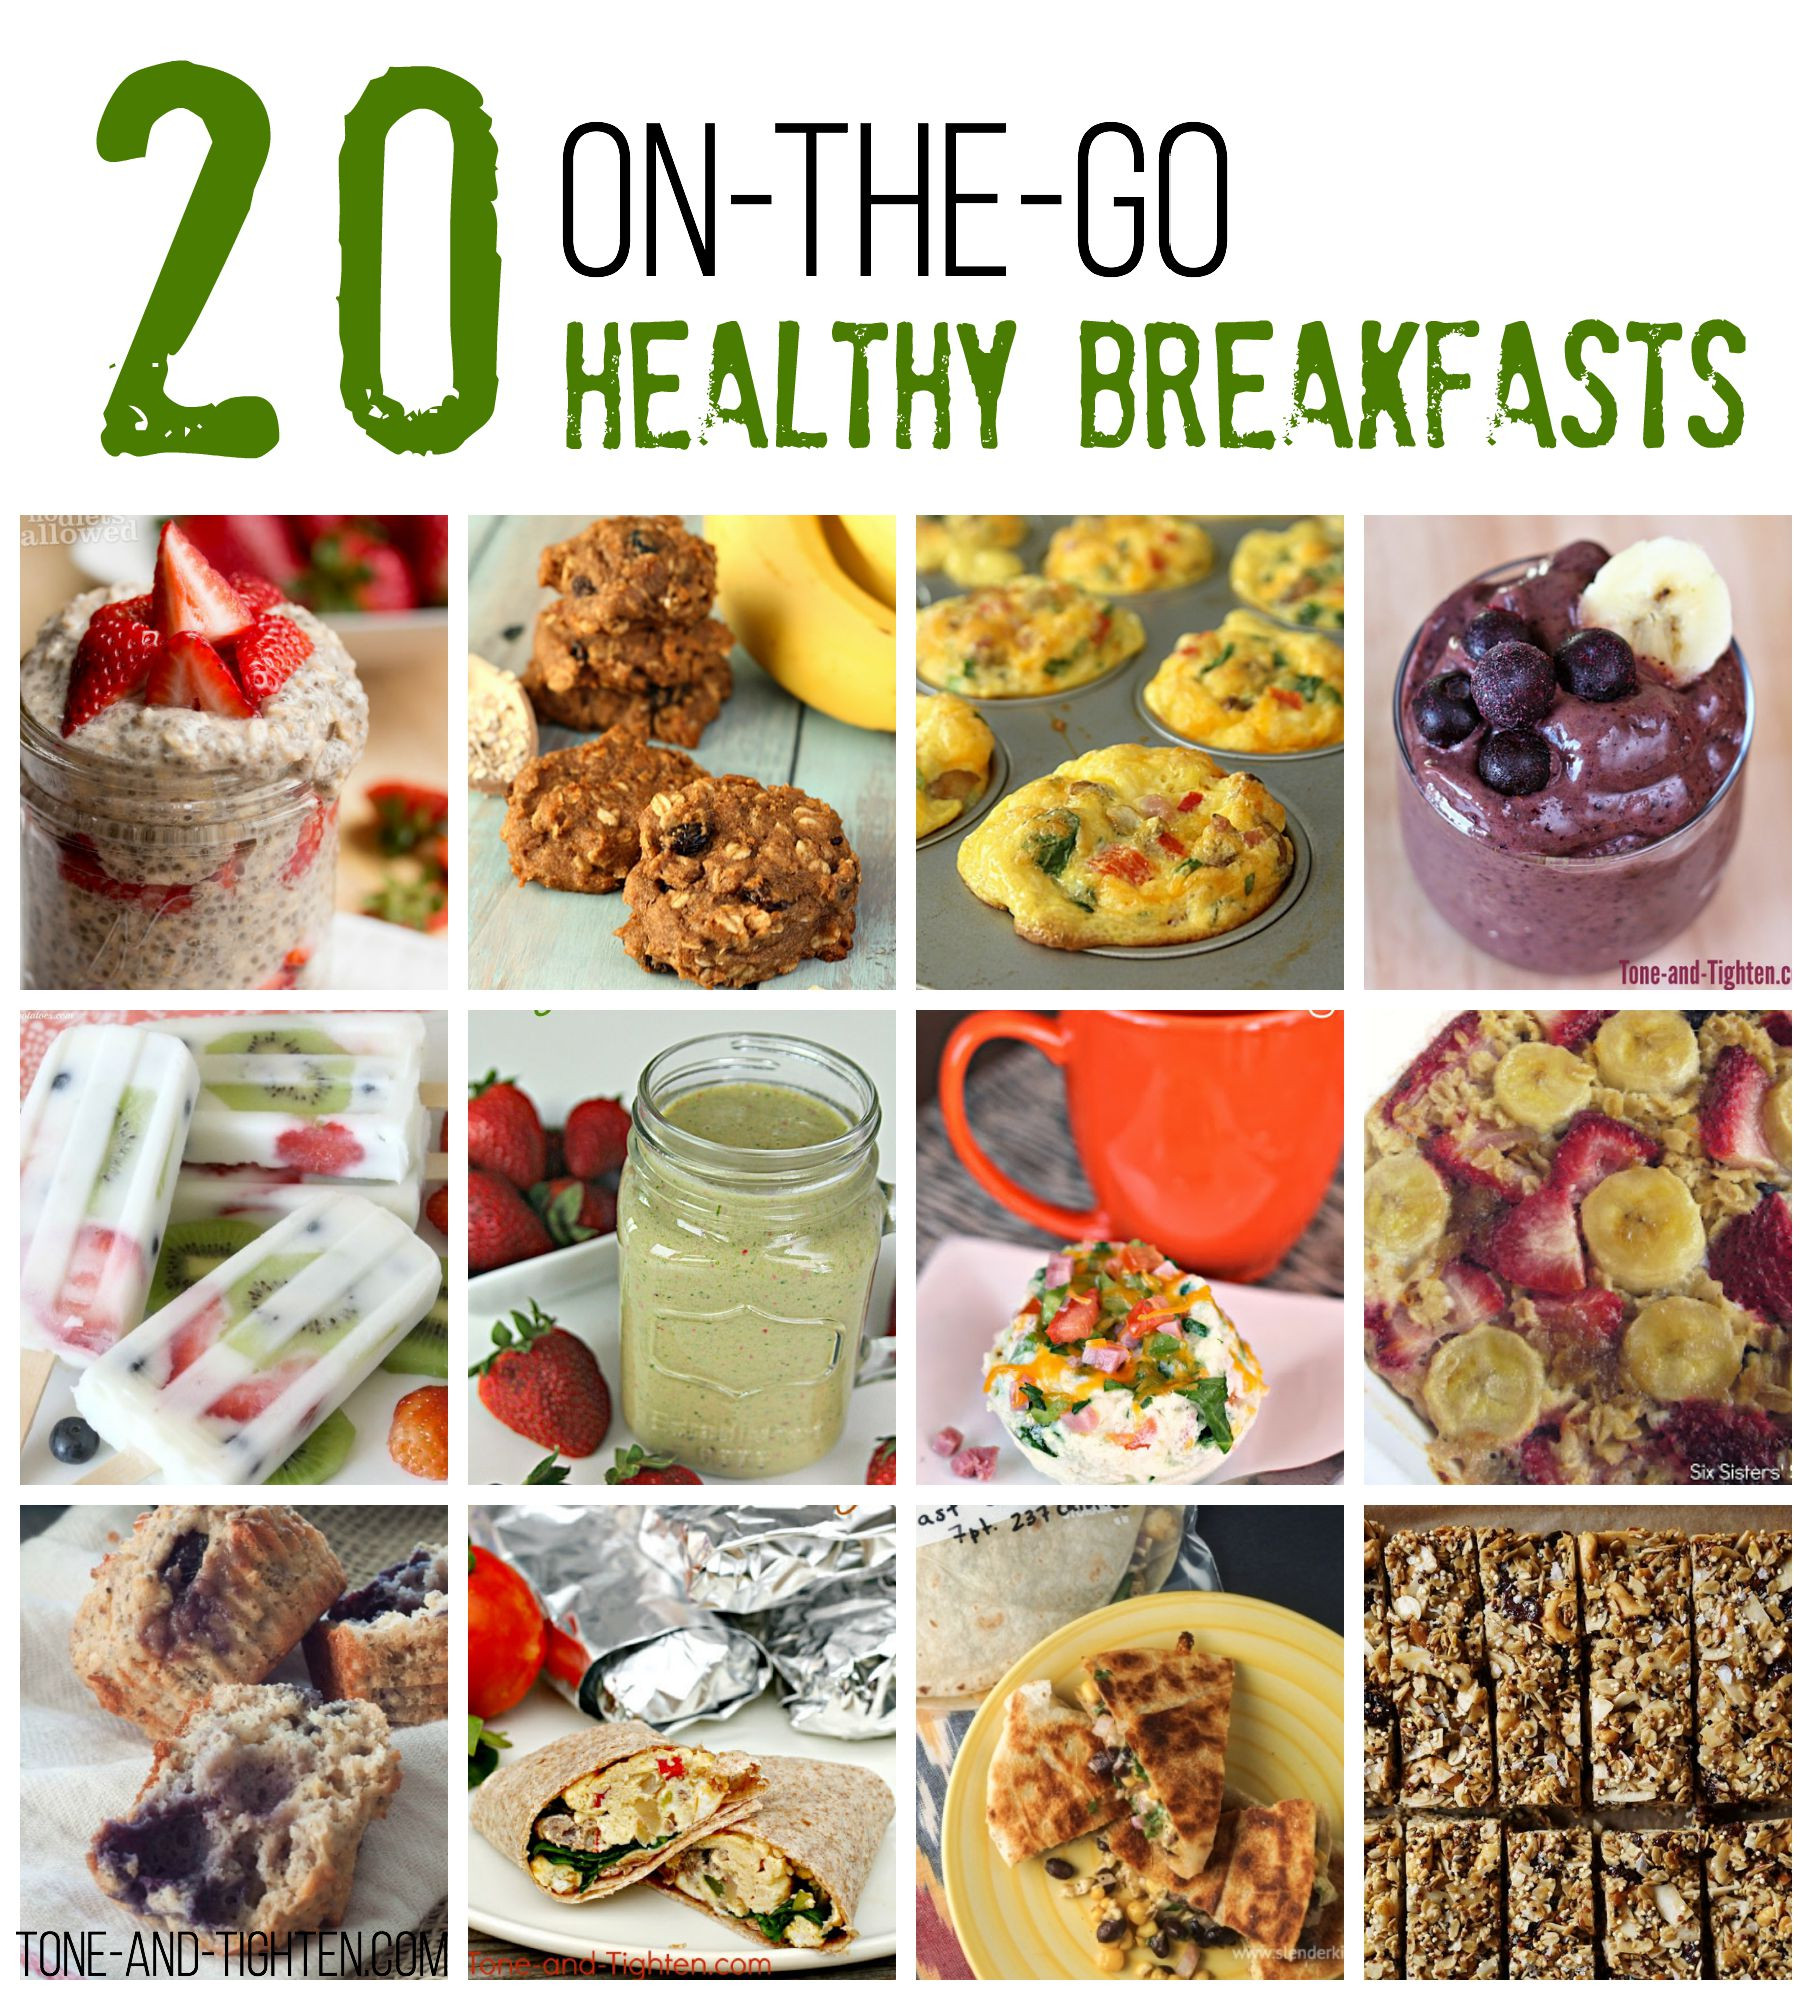 Healthy Breakfast To Go  20 The Go Healthy Breakfast Recipes